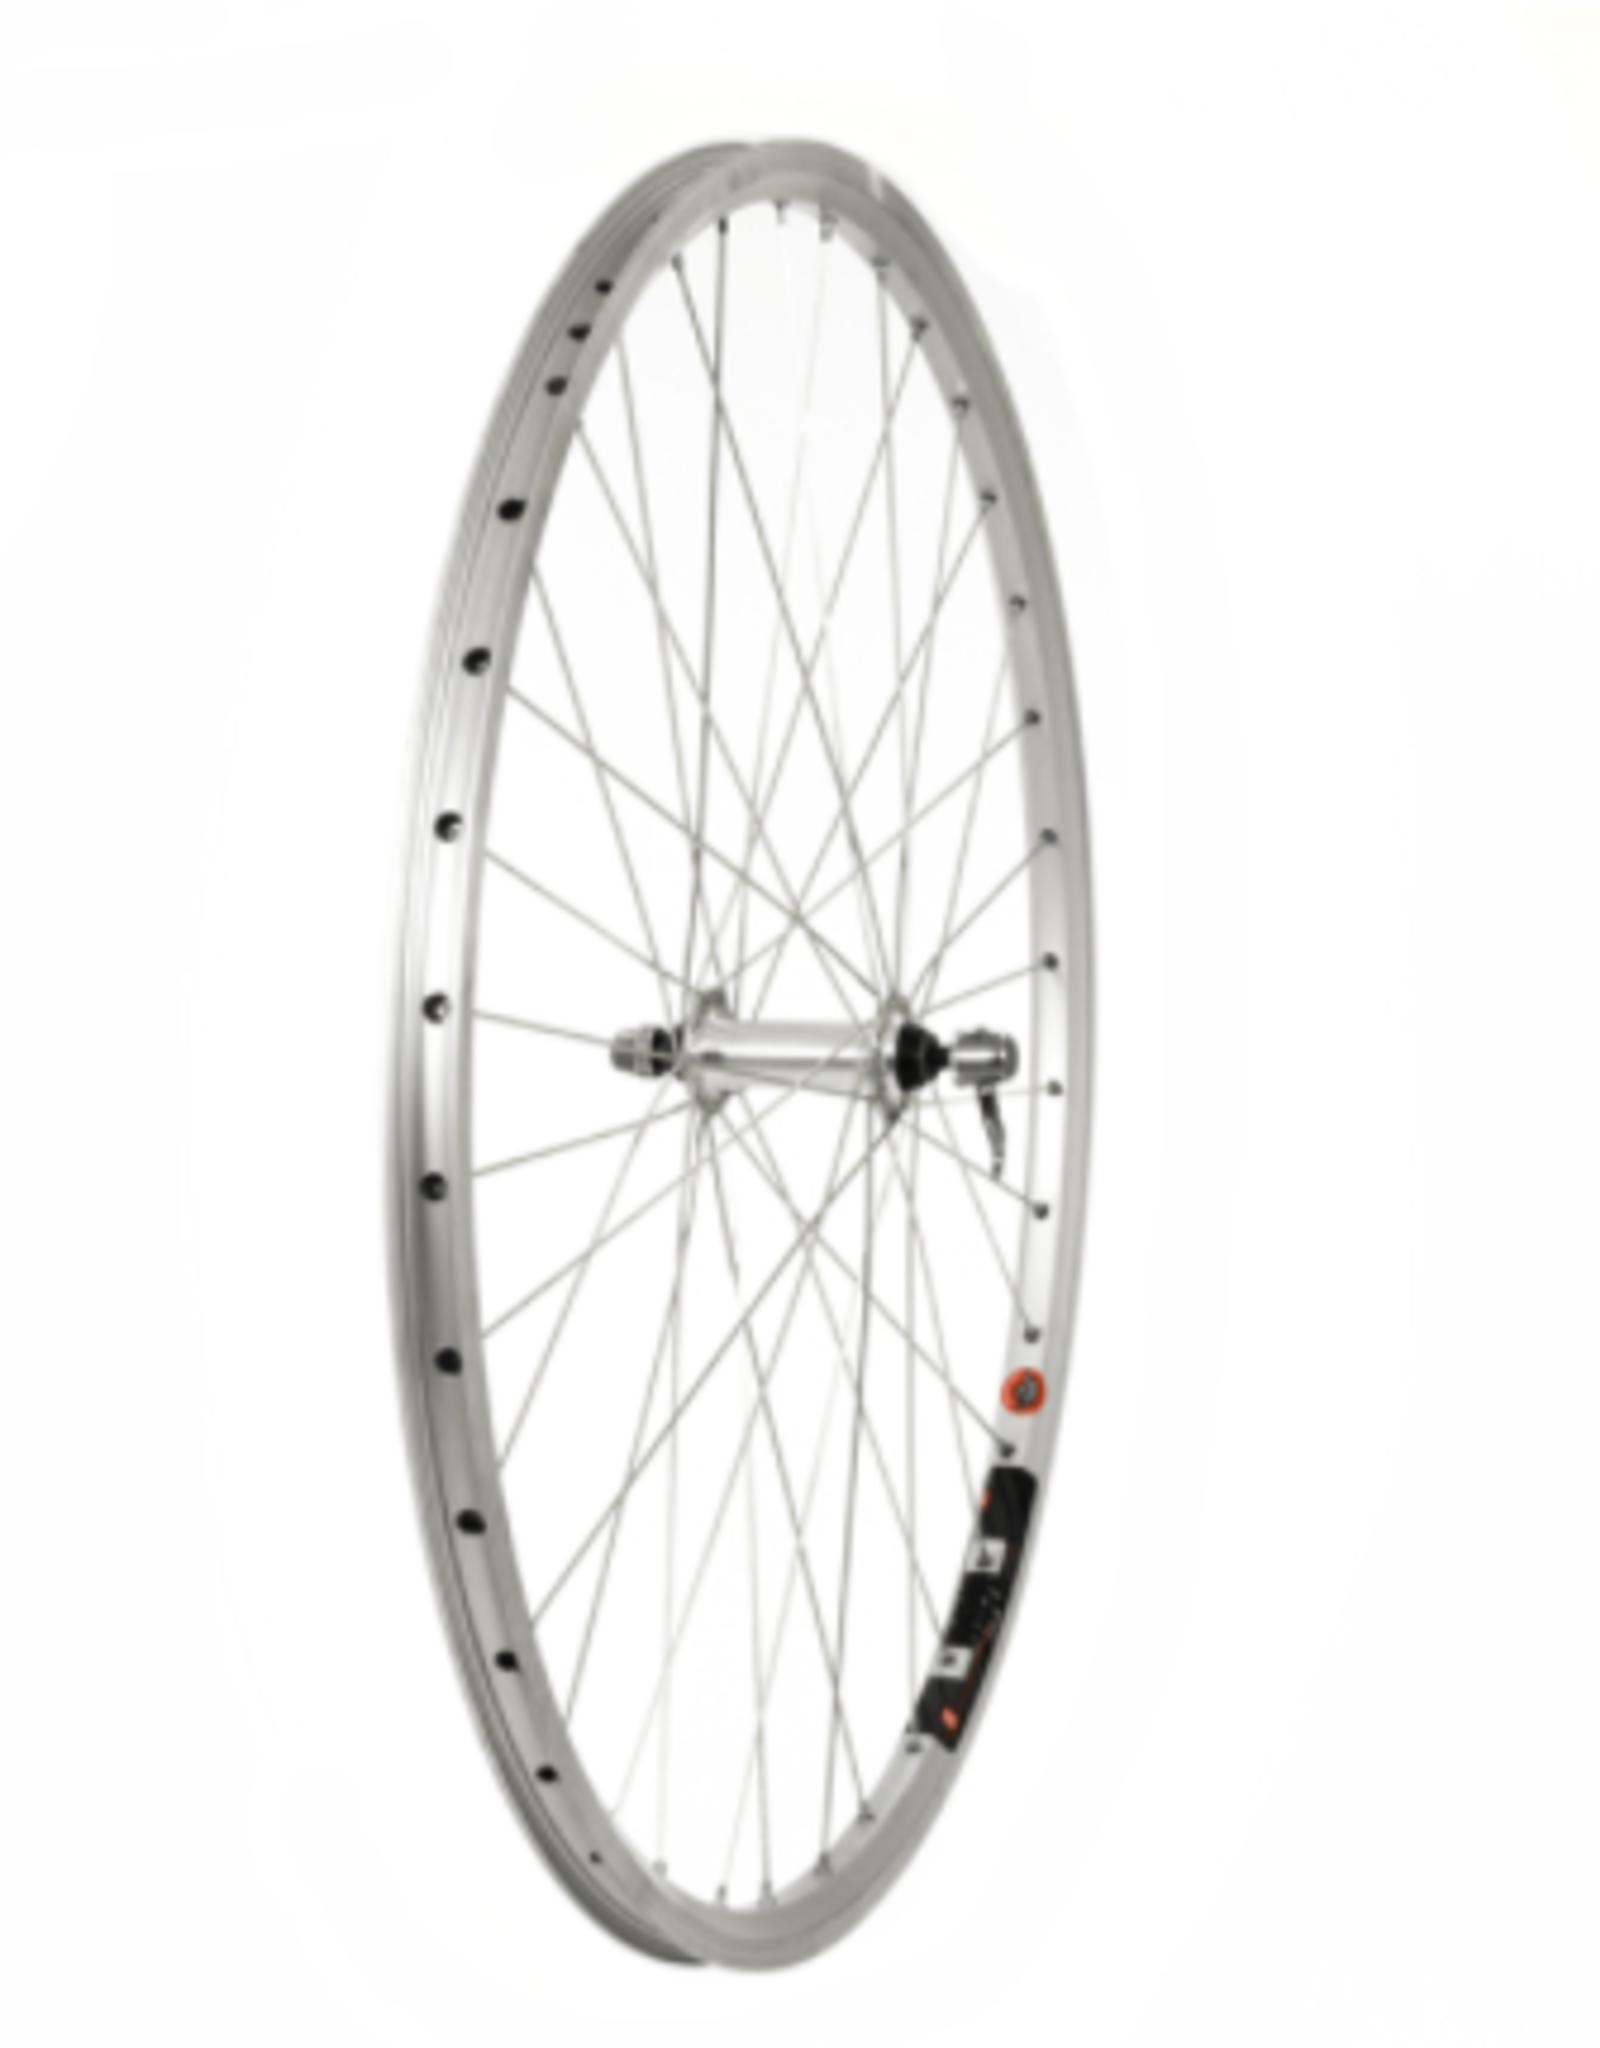 Raleigh 700C Front Trekking Wheel in silver, suitable for most trekking/hybrid bikes.